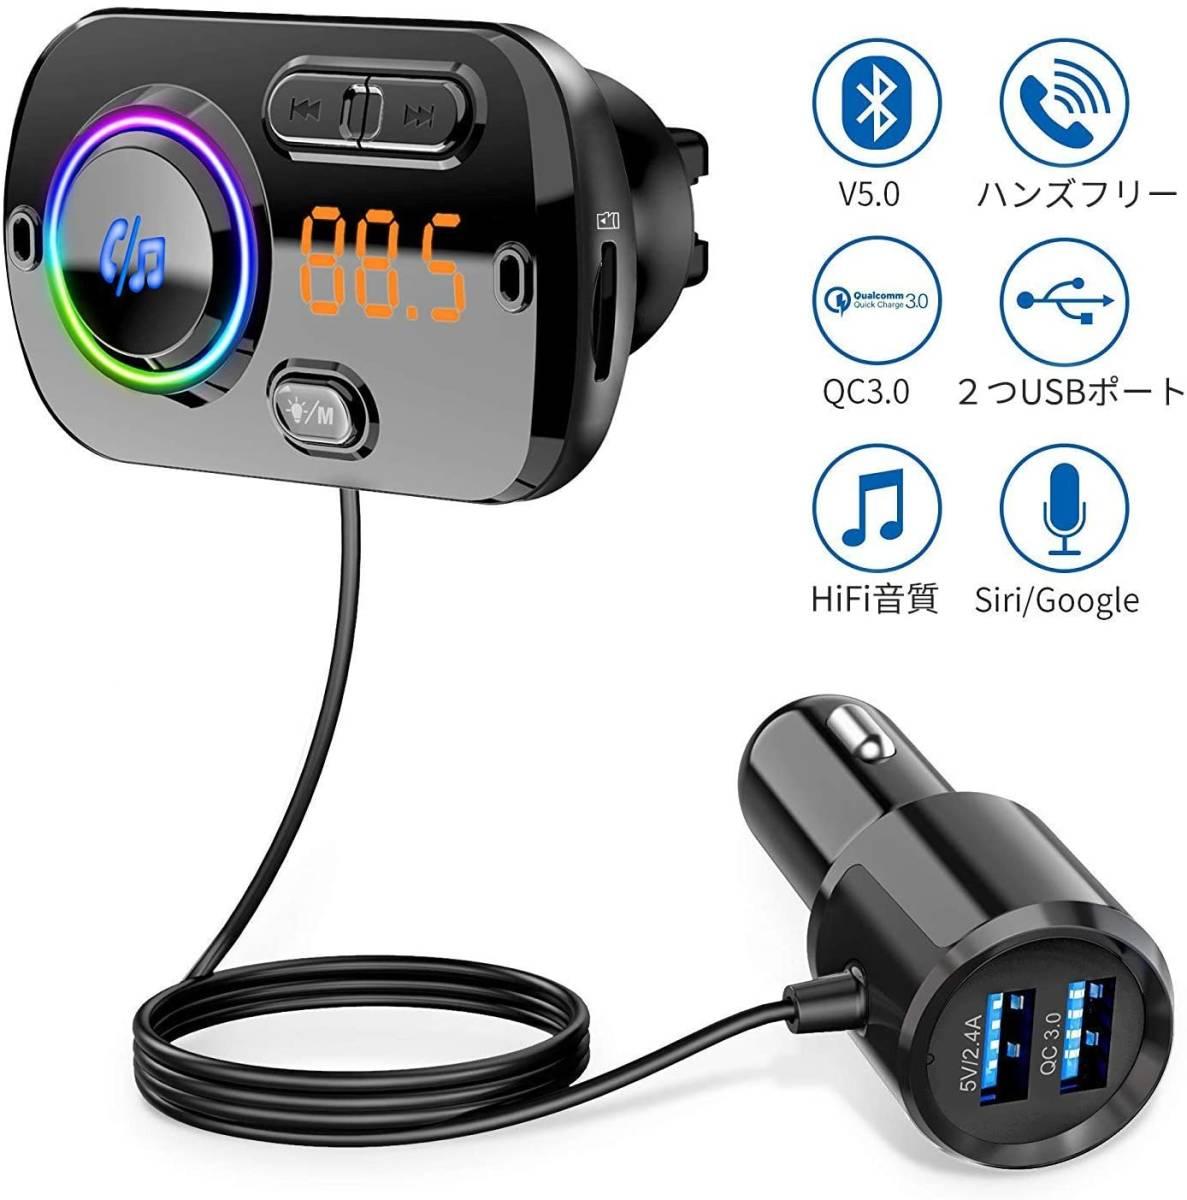 FMトランスミッター USB 車載充電器 Bluetooth 5.0+EDR TFカード/Aux-in対応 Google assistant&Siri対応. 波数仕様 87.5~108.0Mhz _画像1